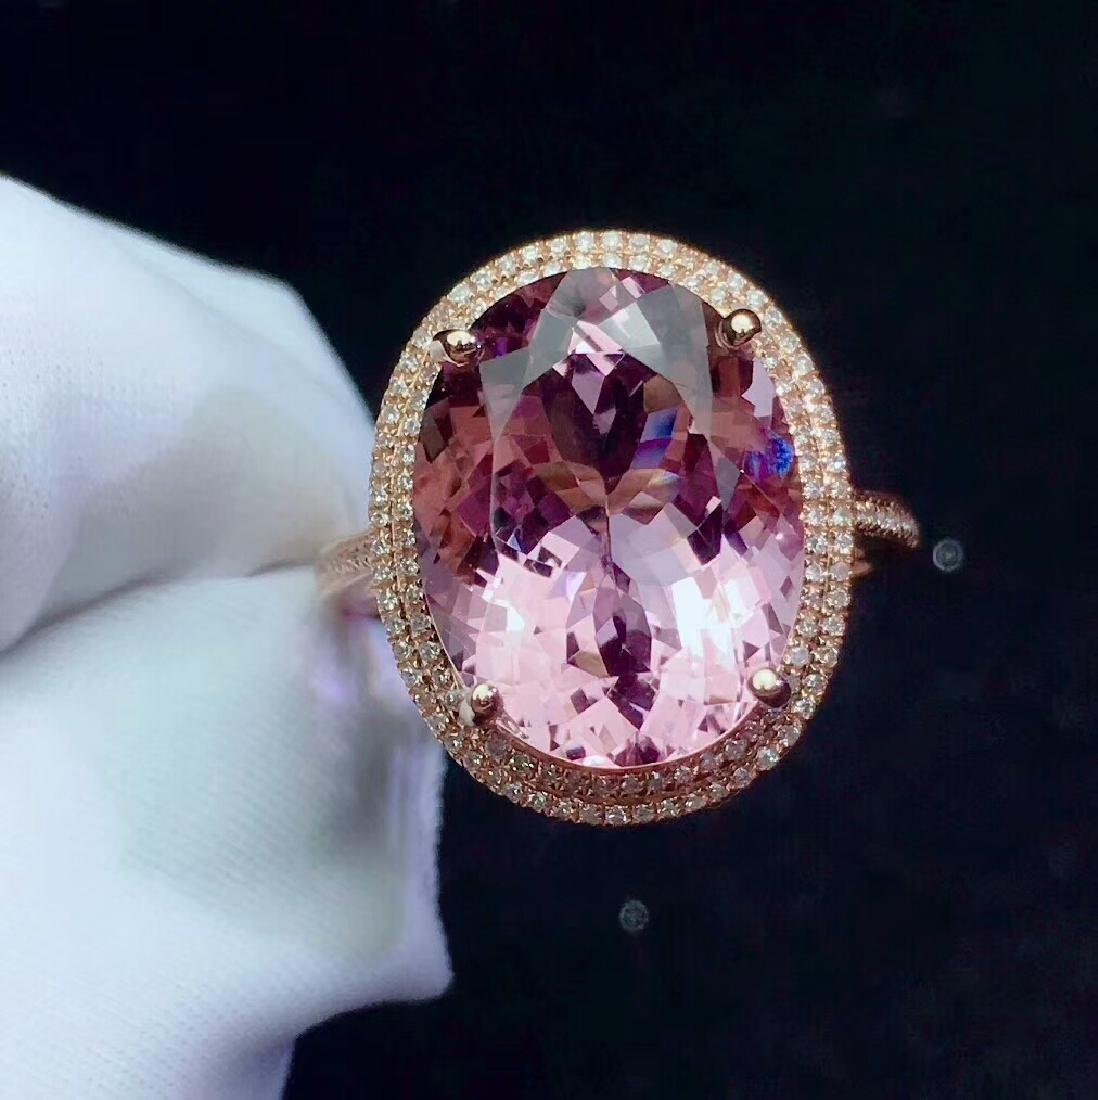 8.9ct Morganite Ring in 18kt white Gold